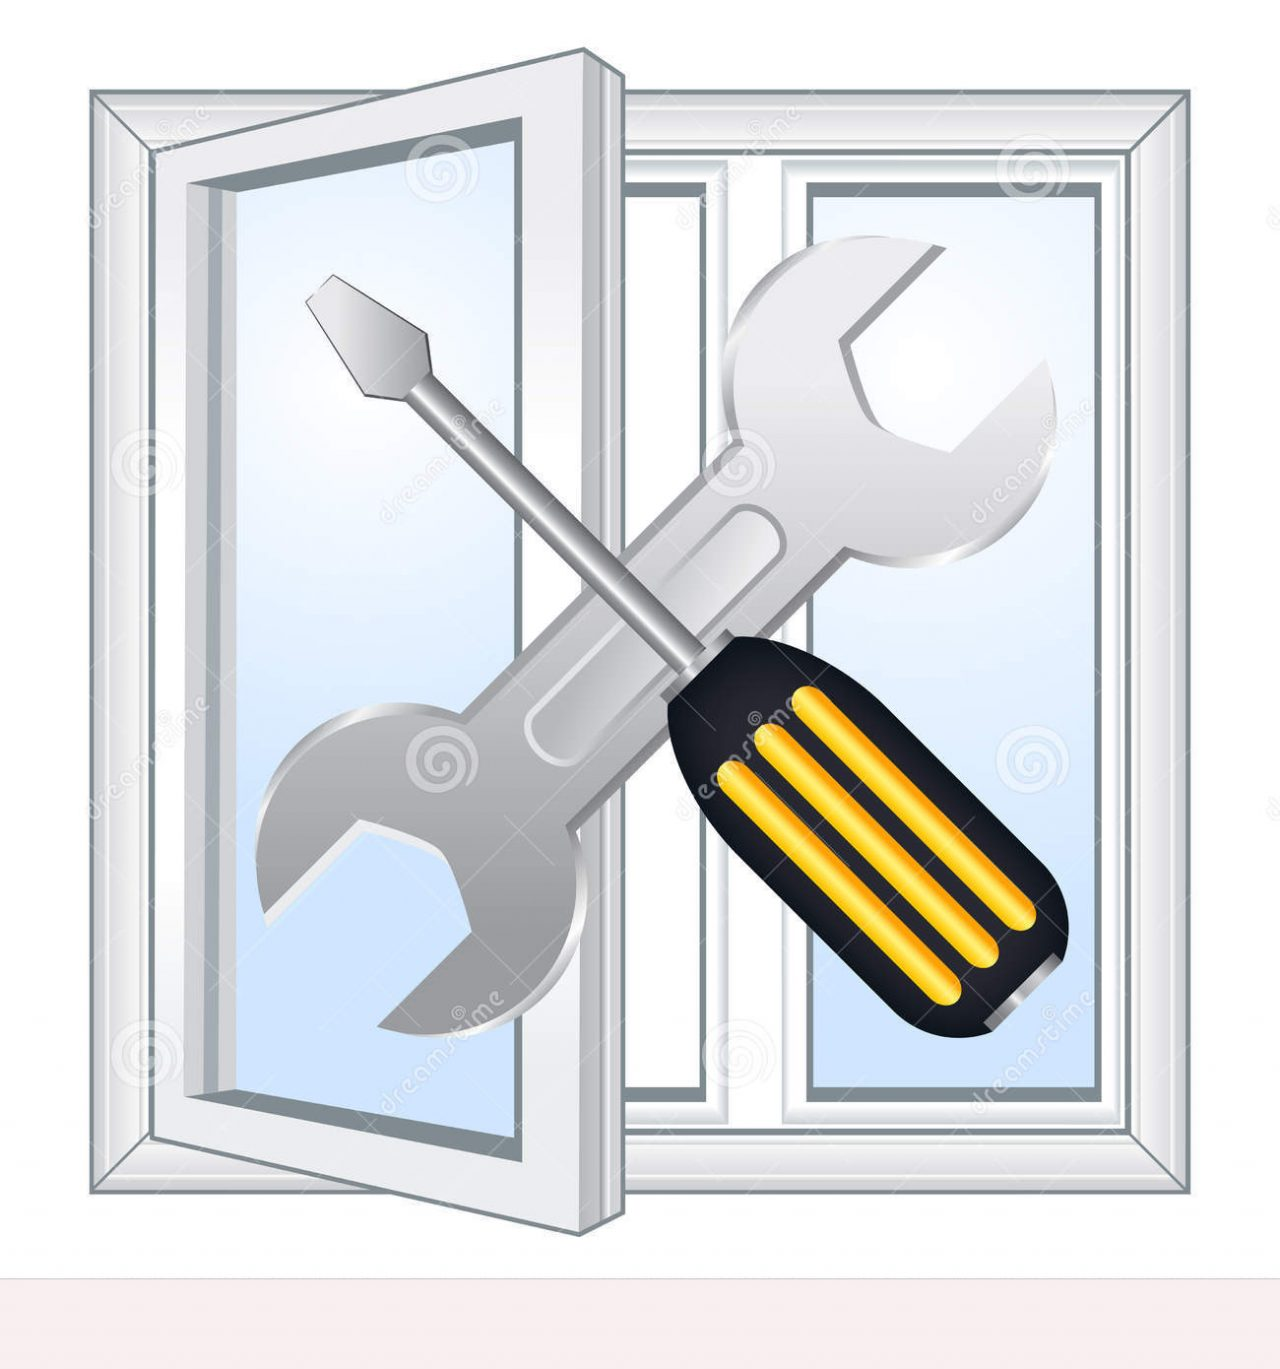 https://reparatiitermopane-pvc.ro/wp-content/uploads/2020/03/window-repair-workshop-vector-emblem-1280x1369.jpg